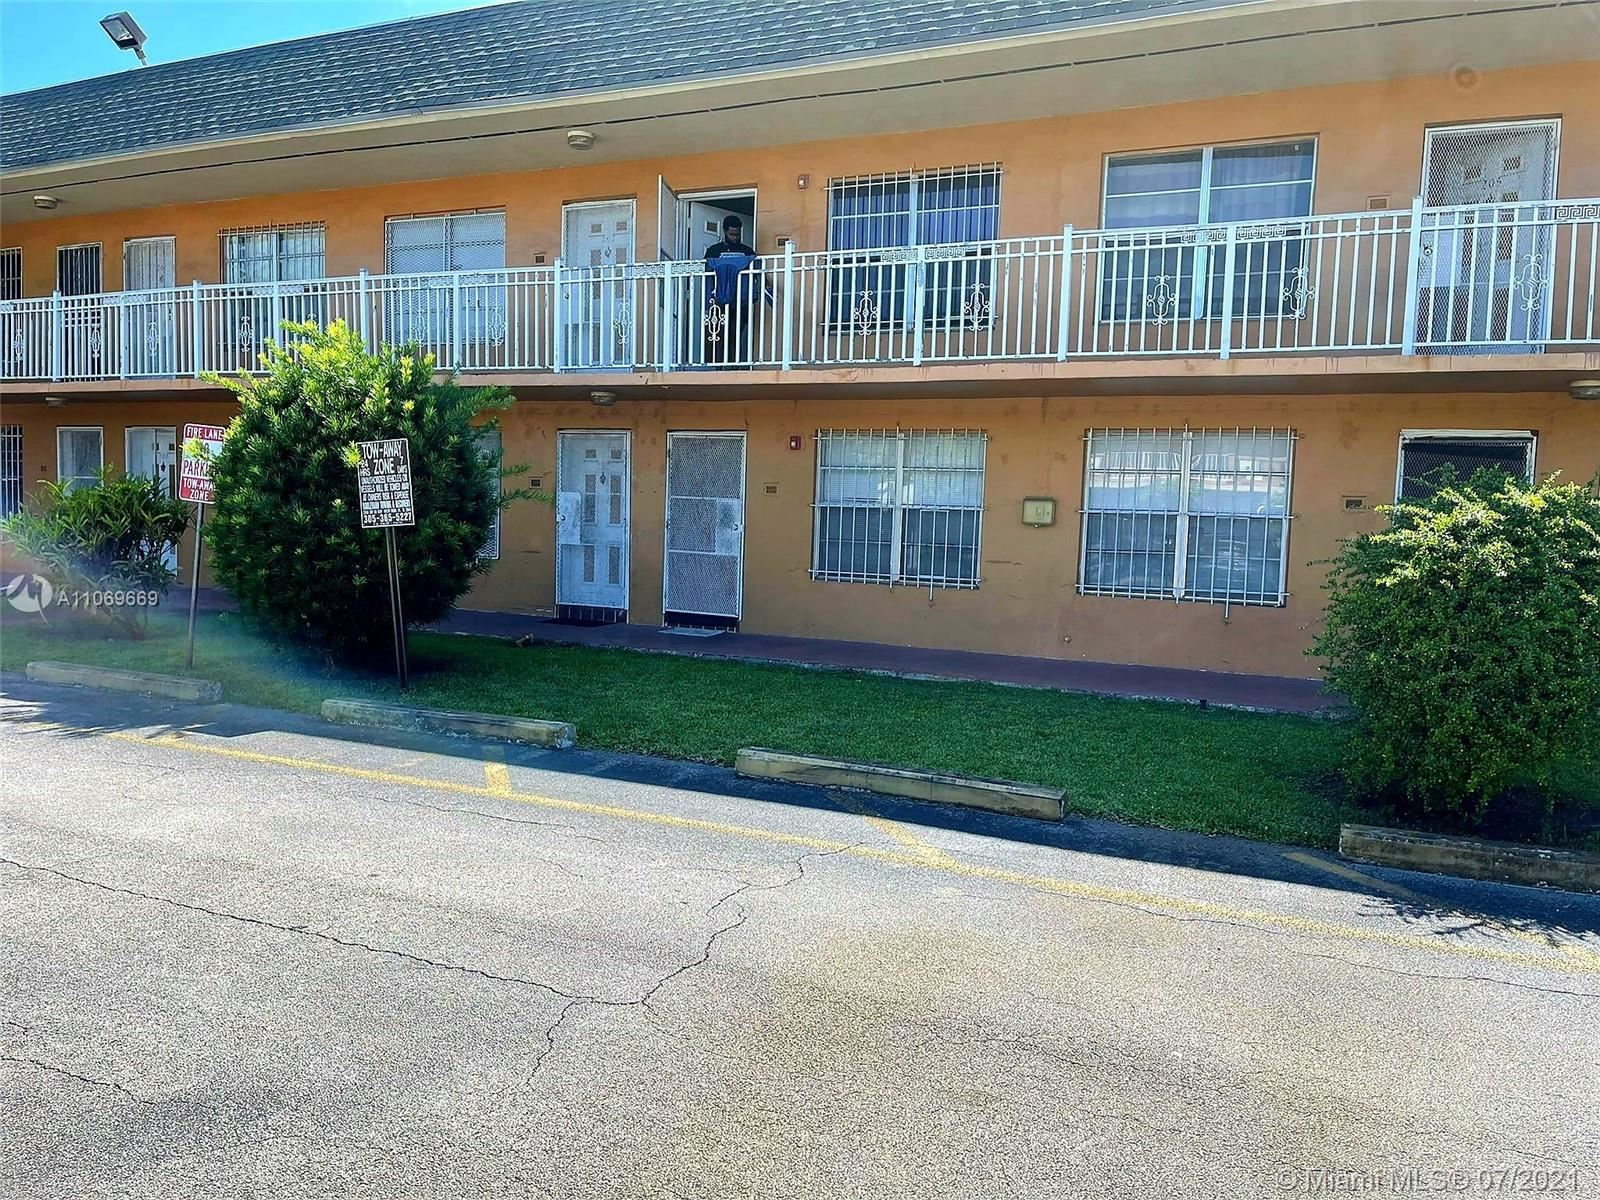 291 NW 177th St #C-107, Miami Gardens, FL 33169 - #: A11069669